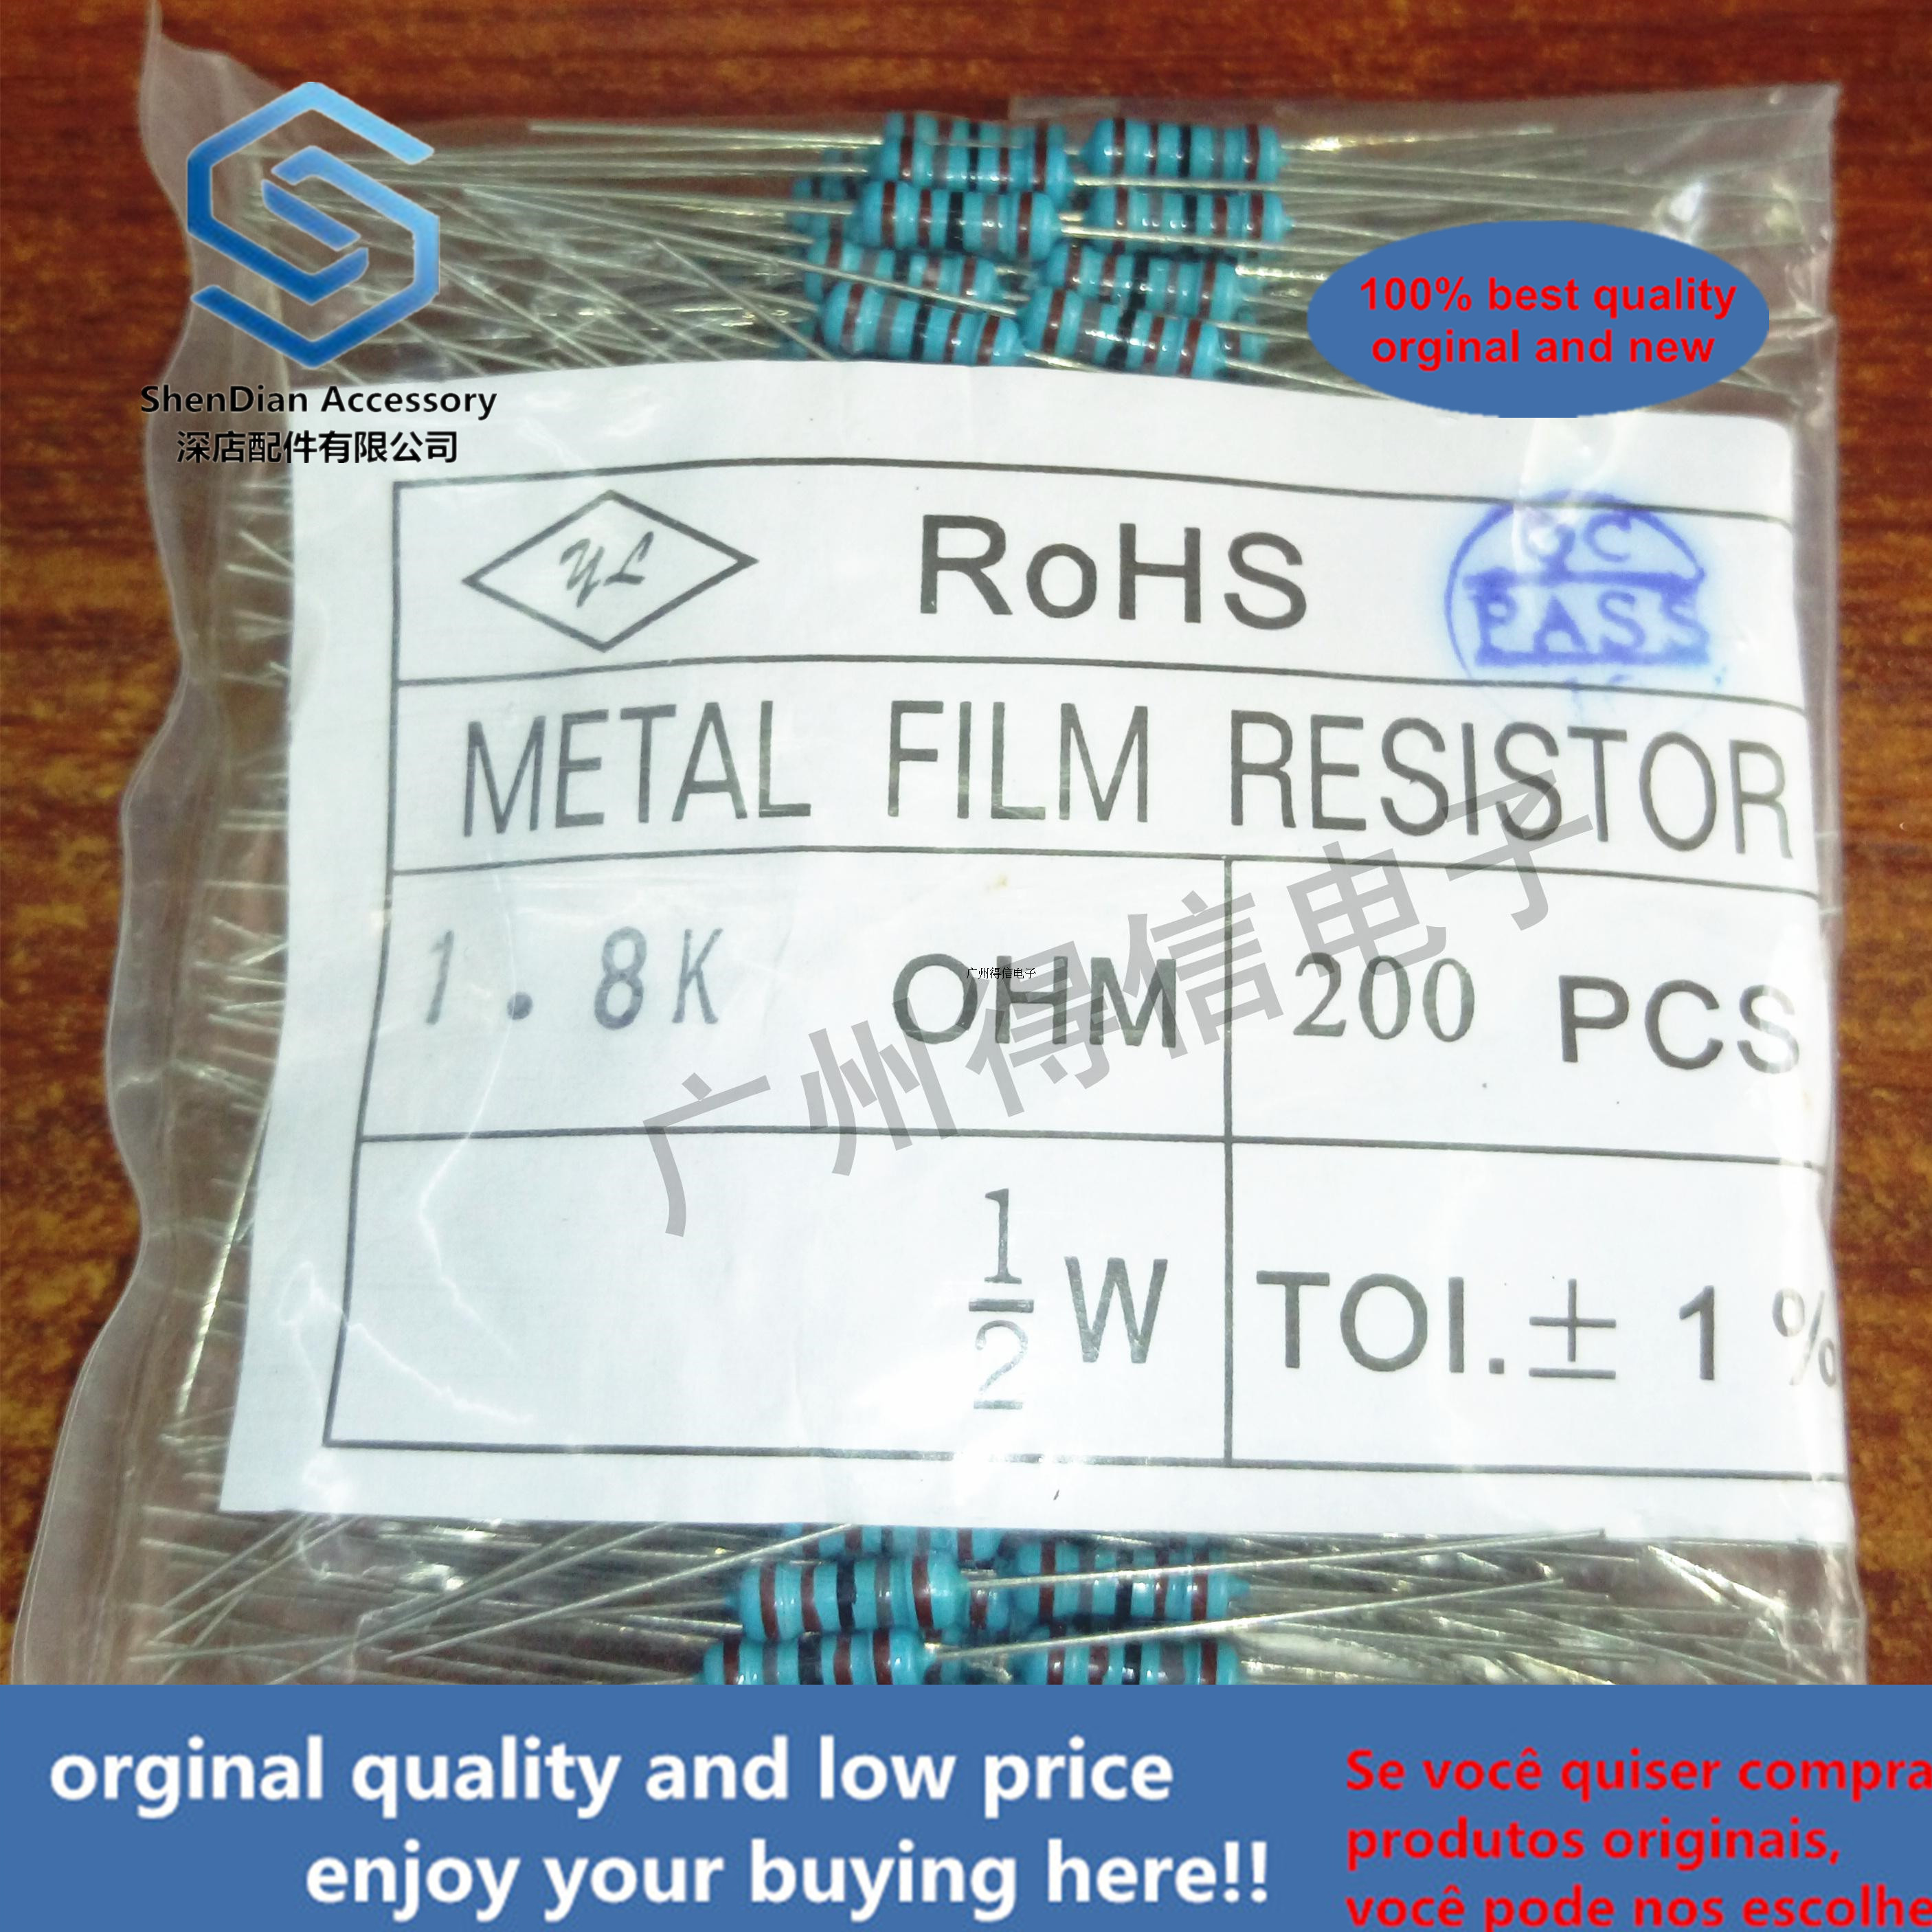 200pcs 1 / 2W 100R 100 Euro 1% Brand New Metal Film Iron Feet Resistance Bag Pack 200 Pcs